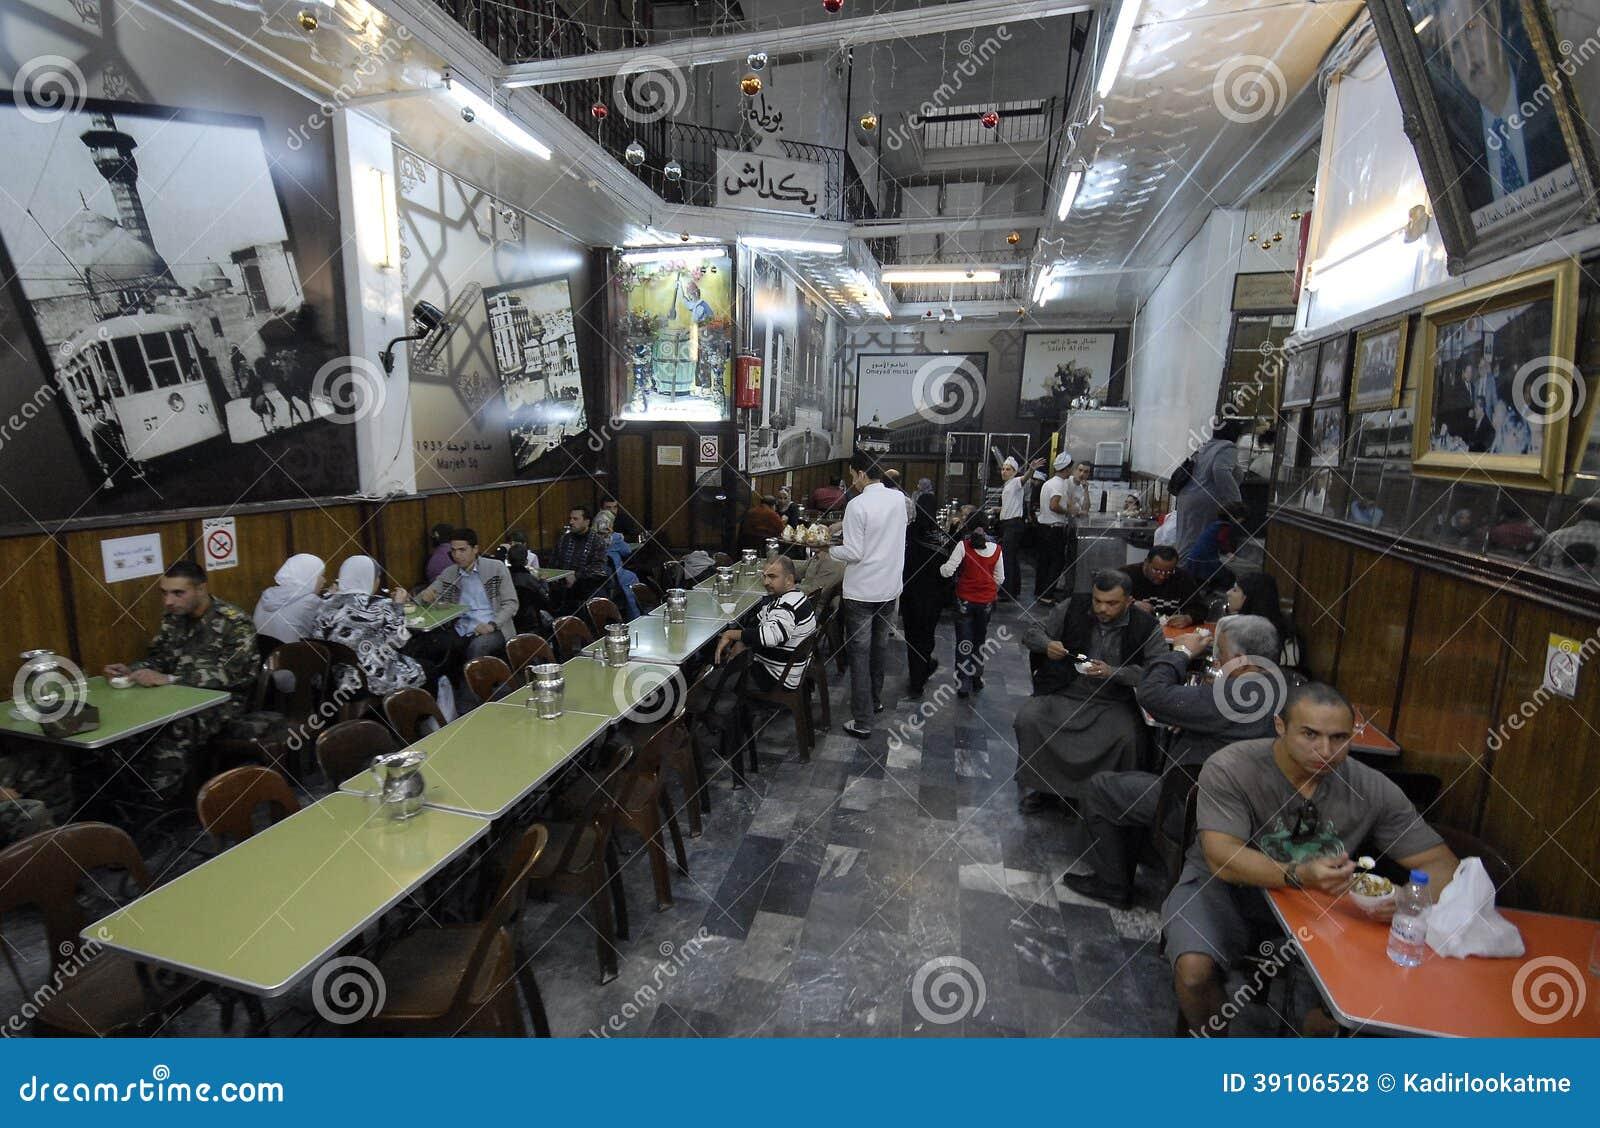 Roomijsverkopers in Aleppo